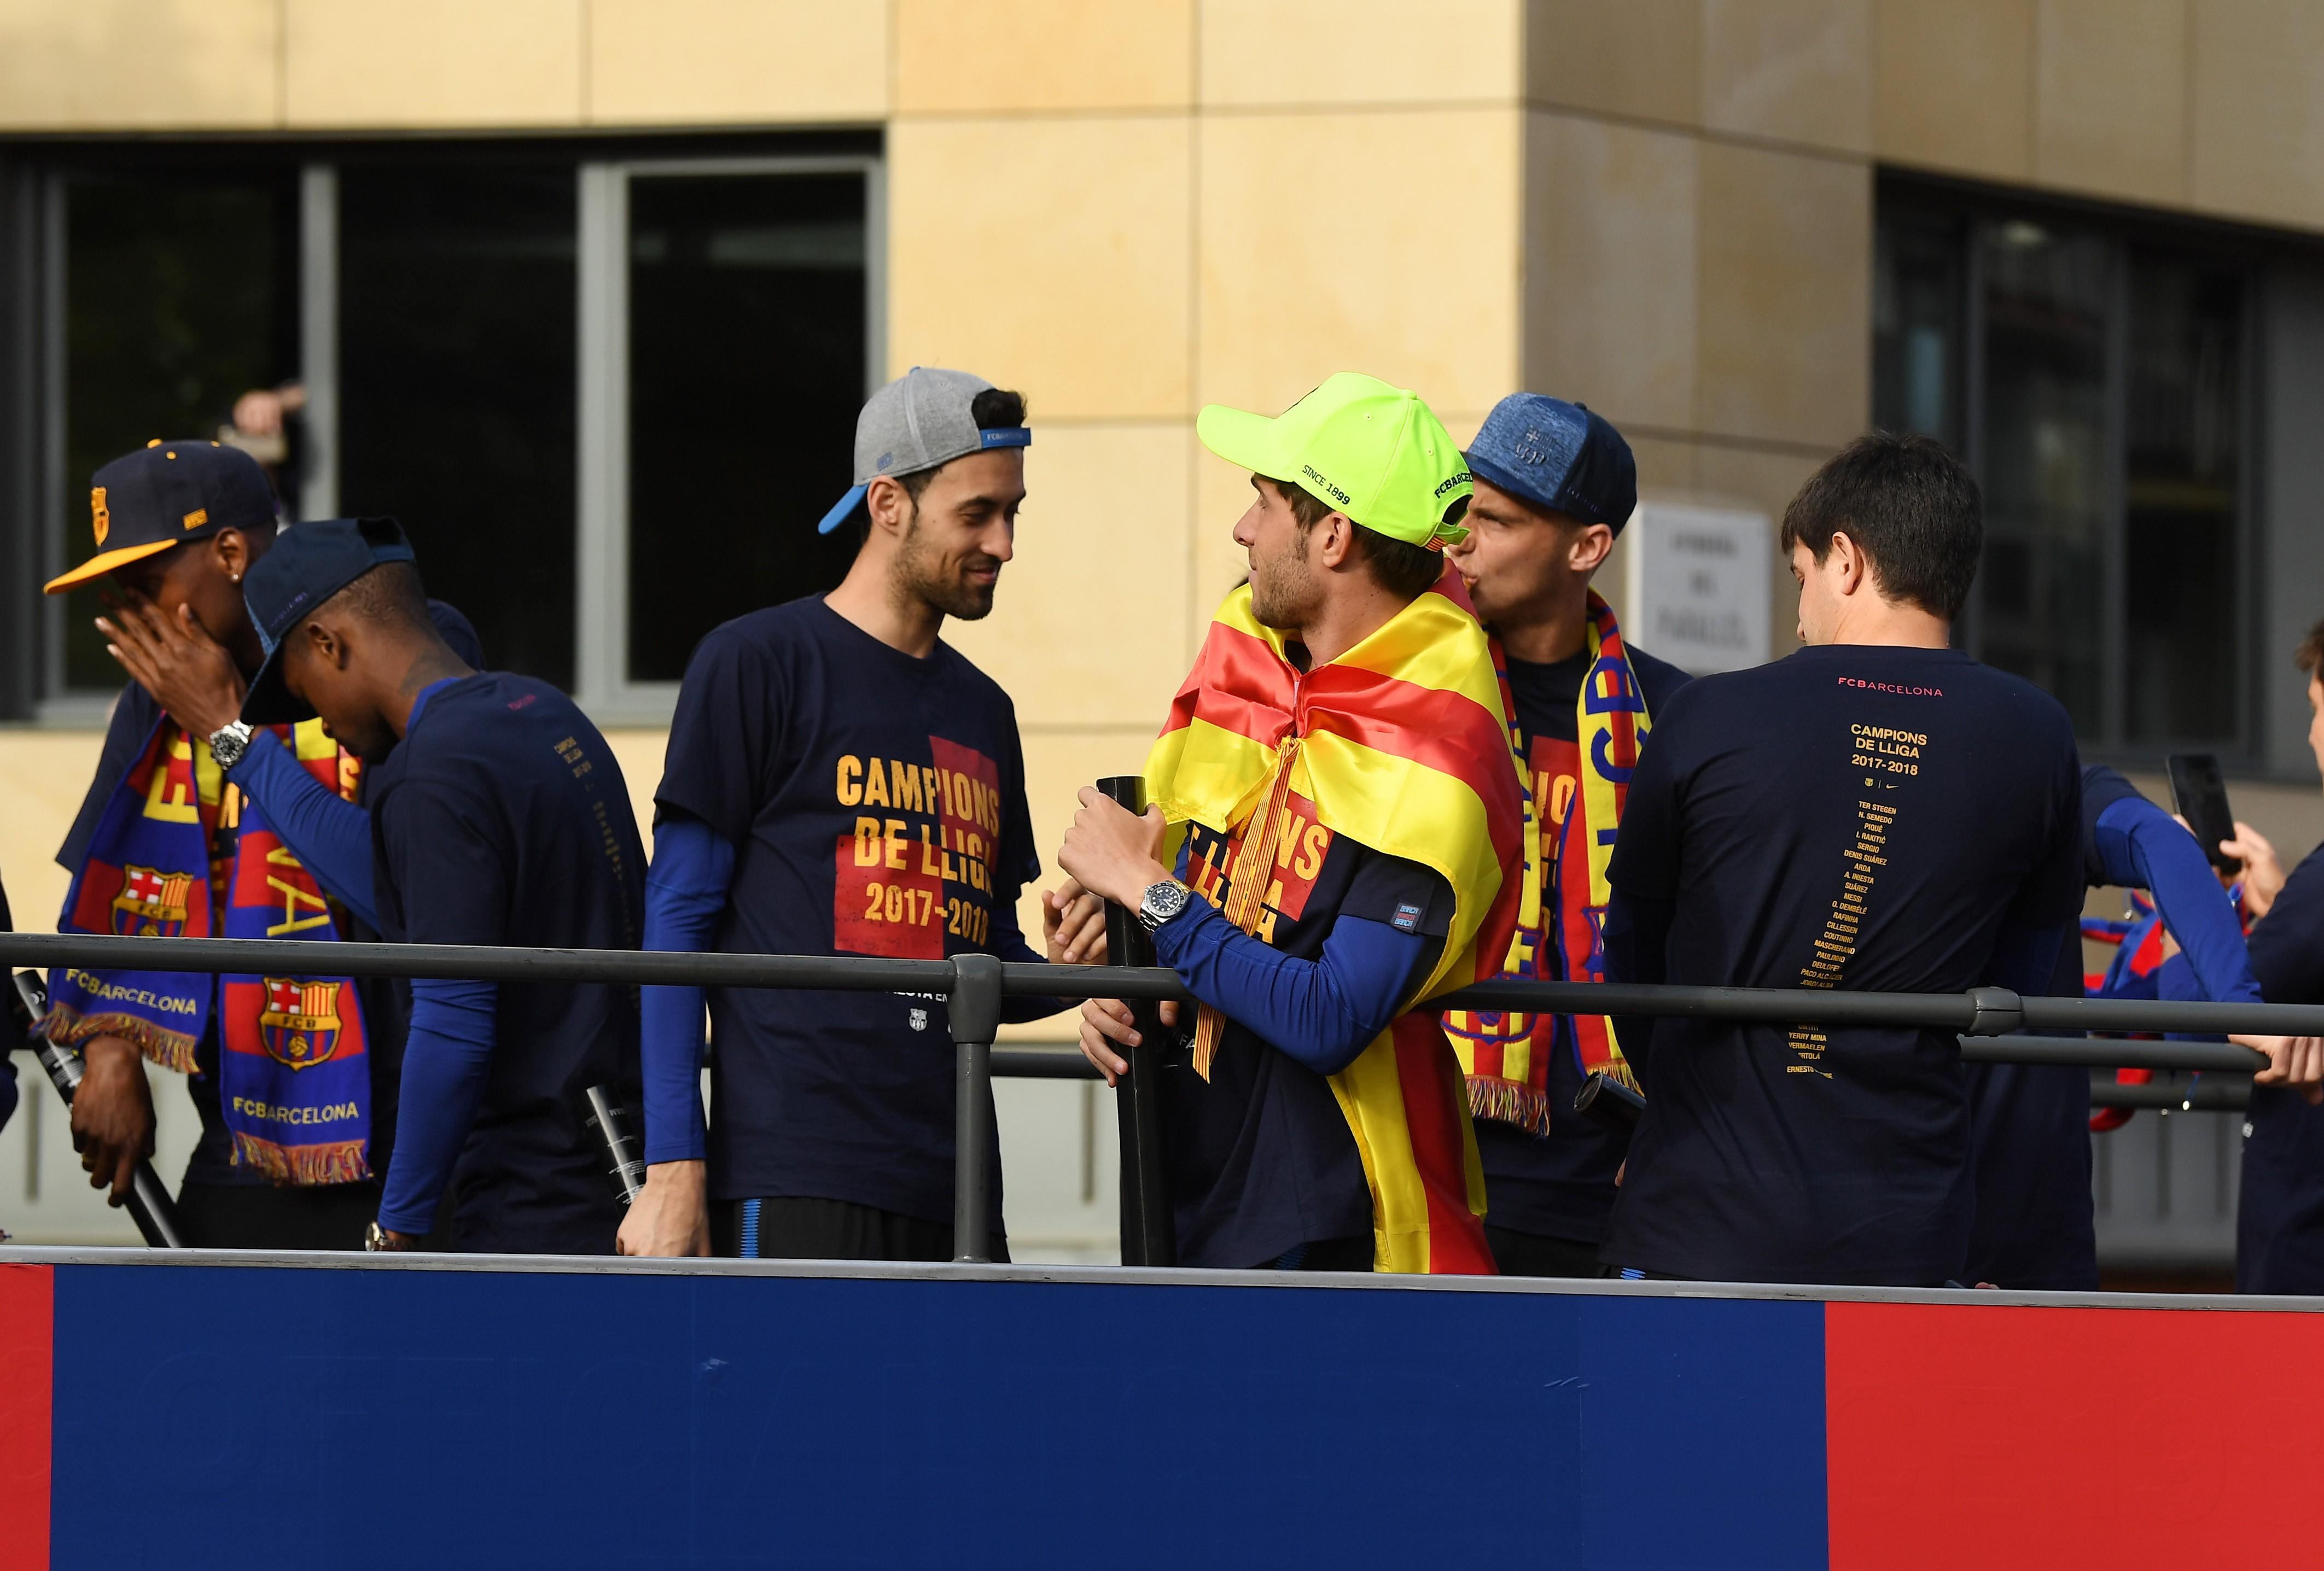 «Барса» внесла фамилии Деулофеу, Маскерано и Турана на футболки